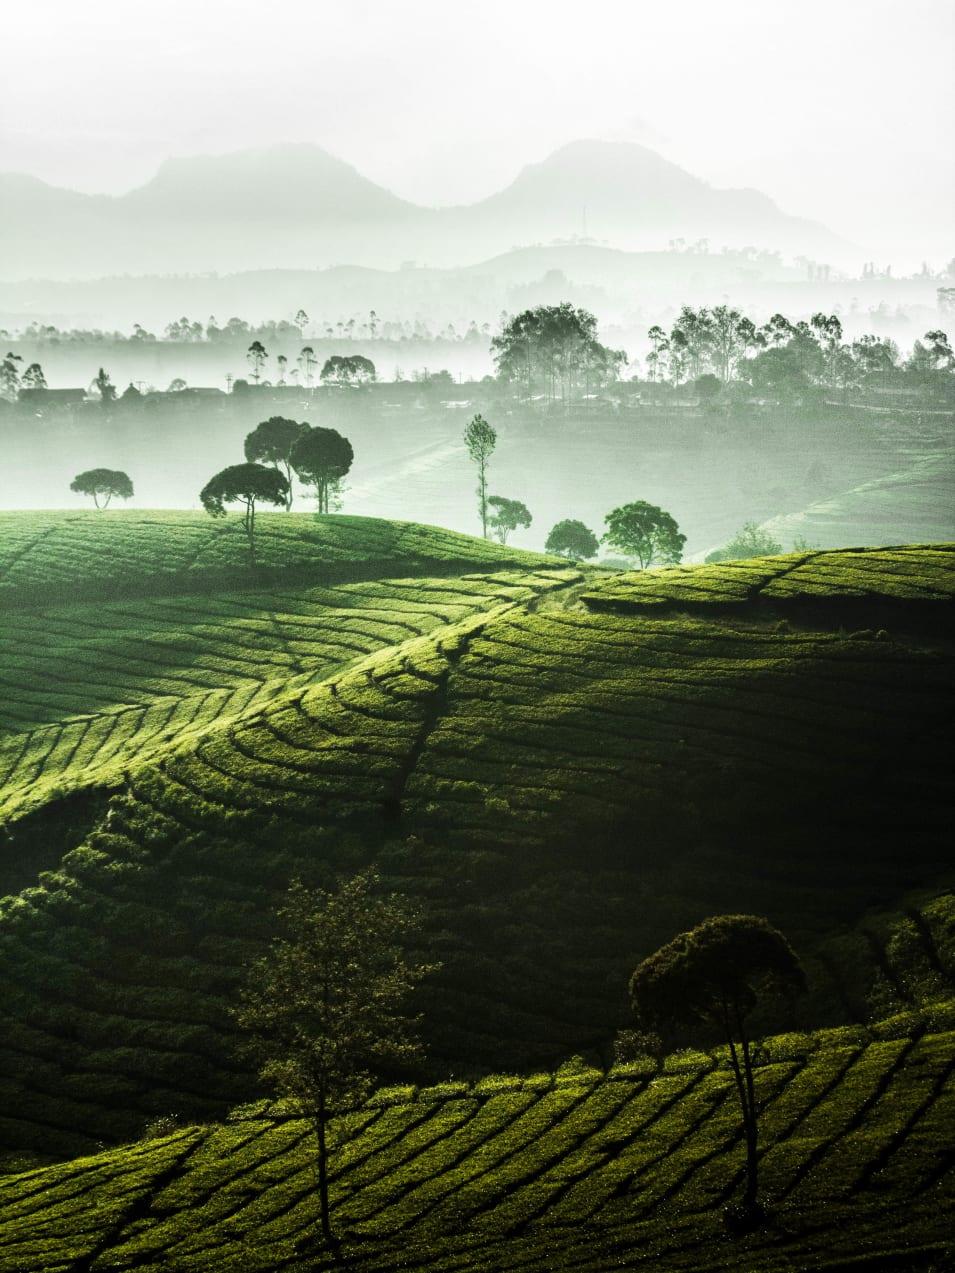 Photo by [Dwinanda Nurhanif Mujito](https://unsplash.com/photos/3vp_7D1xd2A)